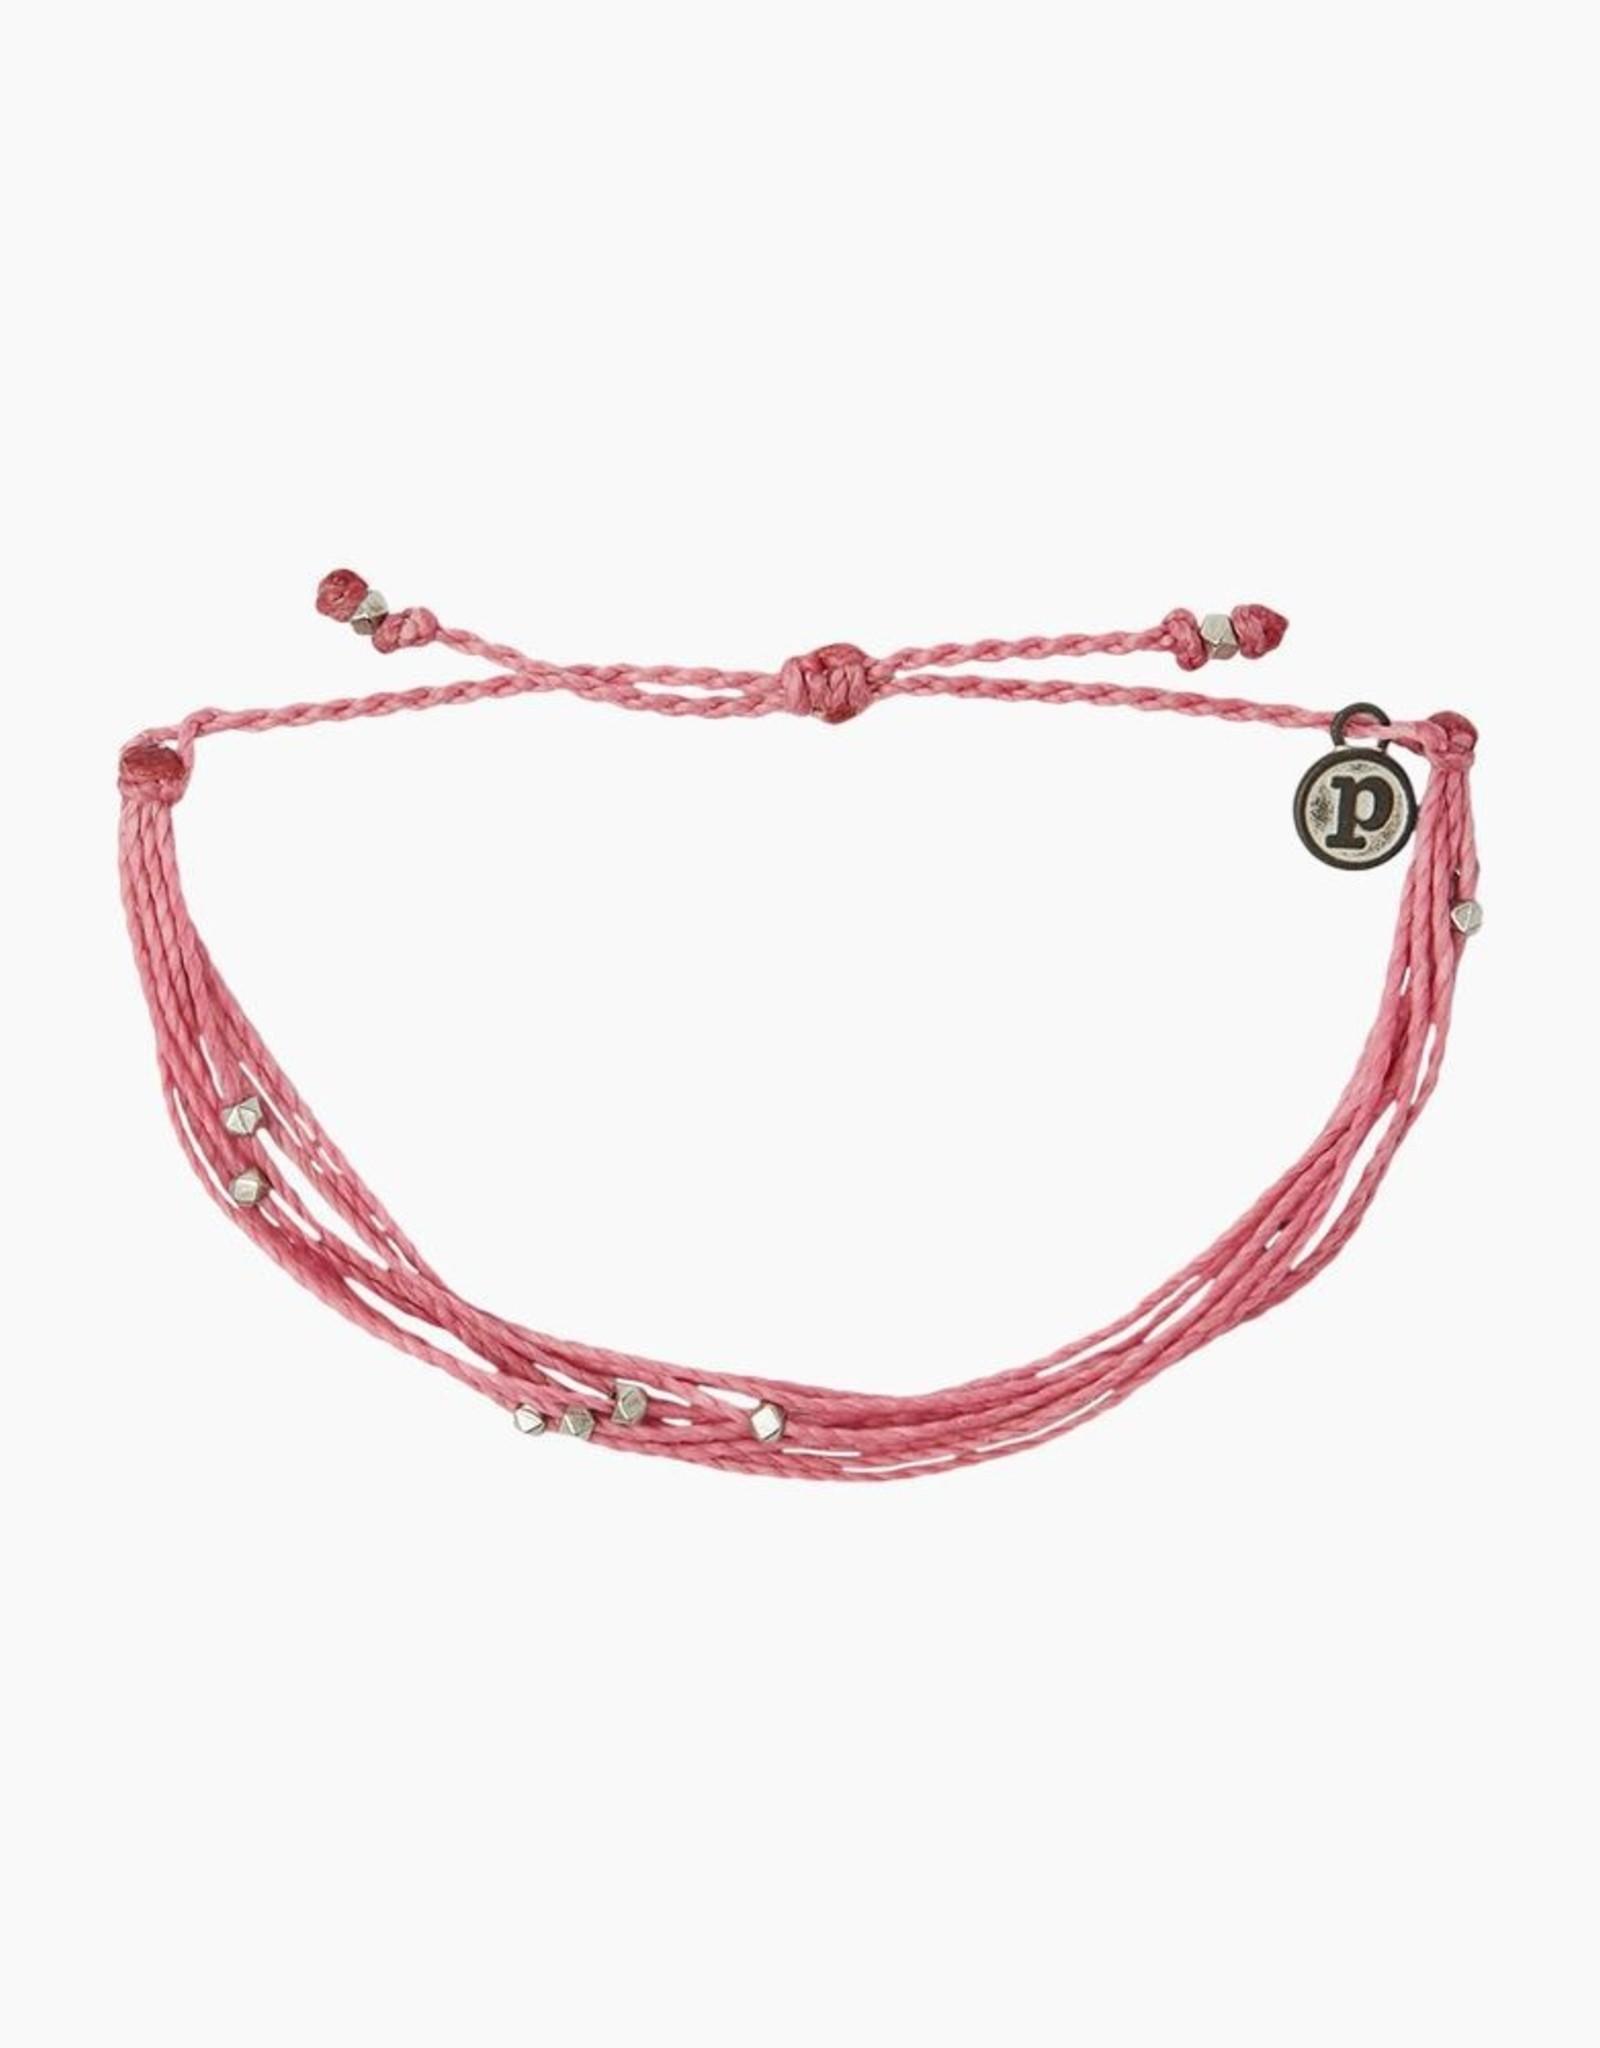 SILVER MALIBU Bracelet,  DARK PINK